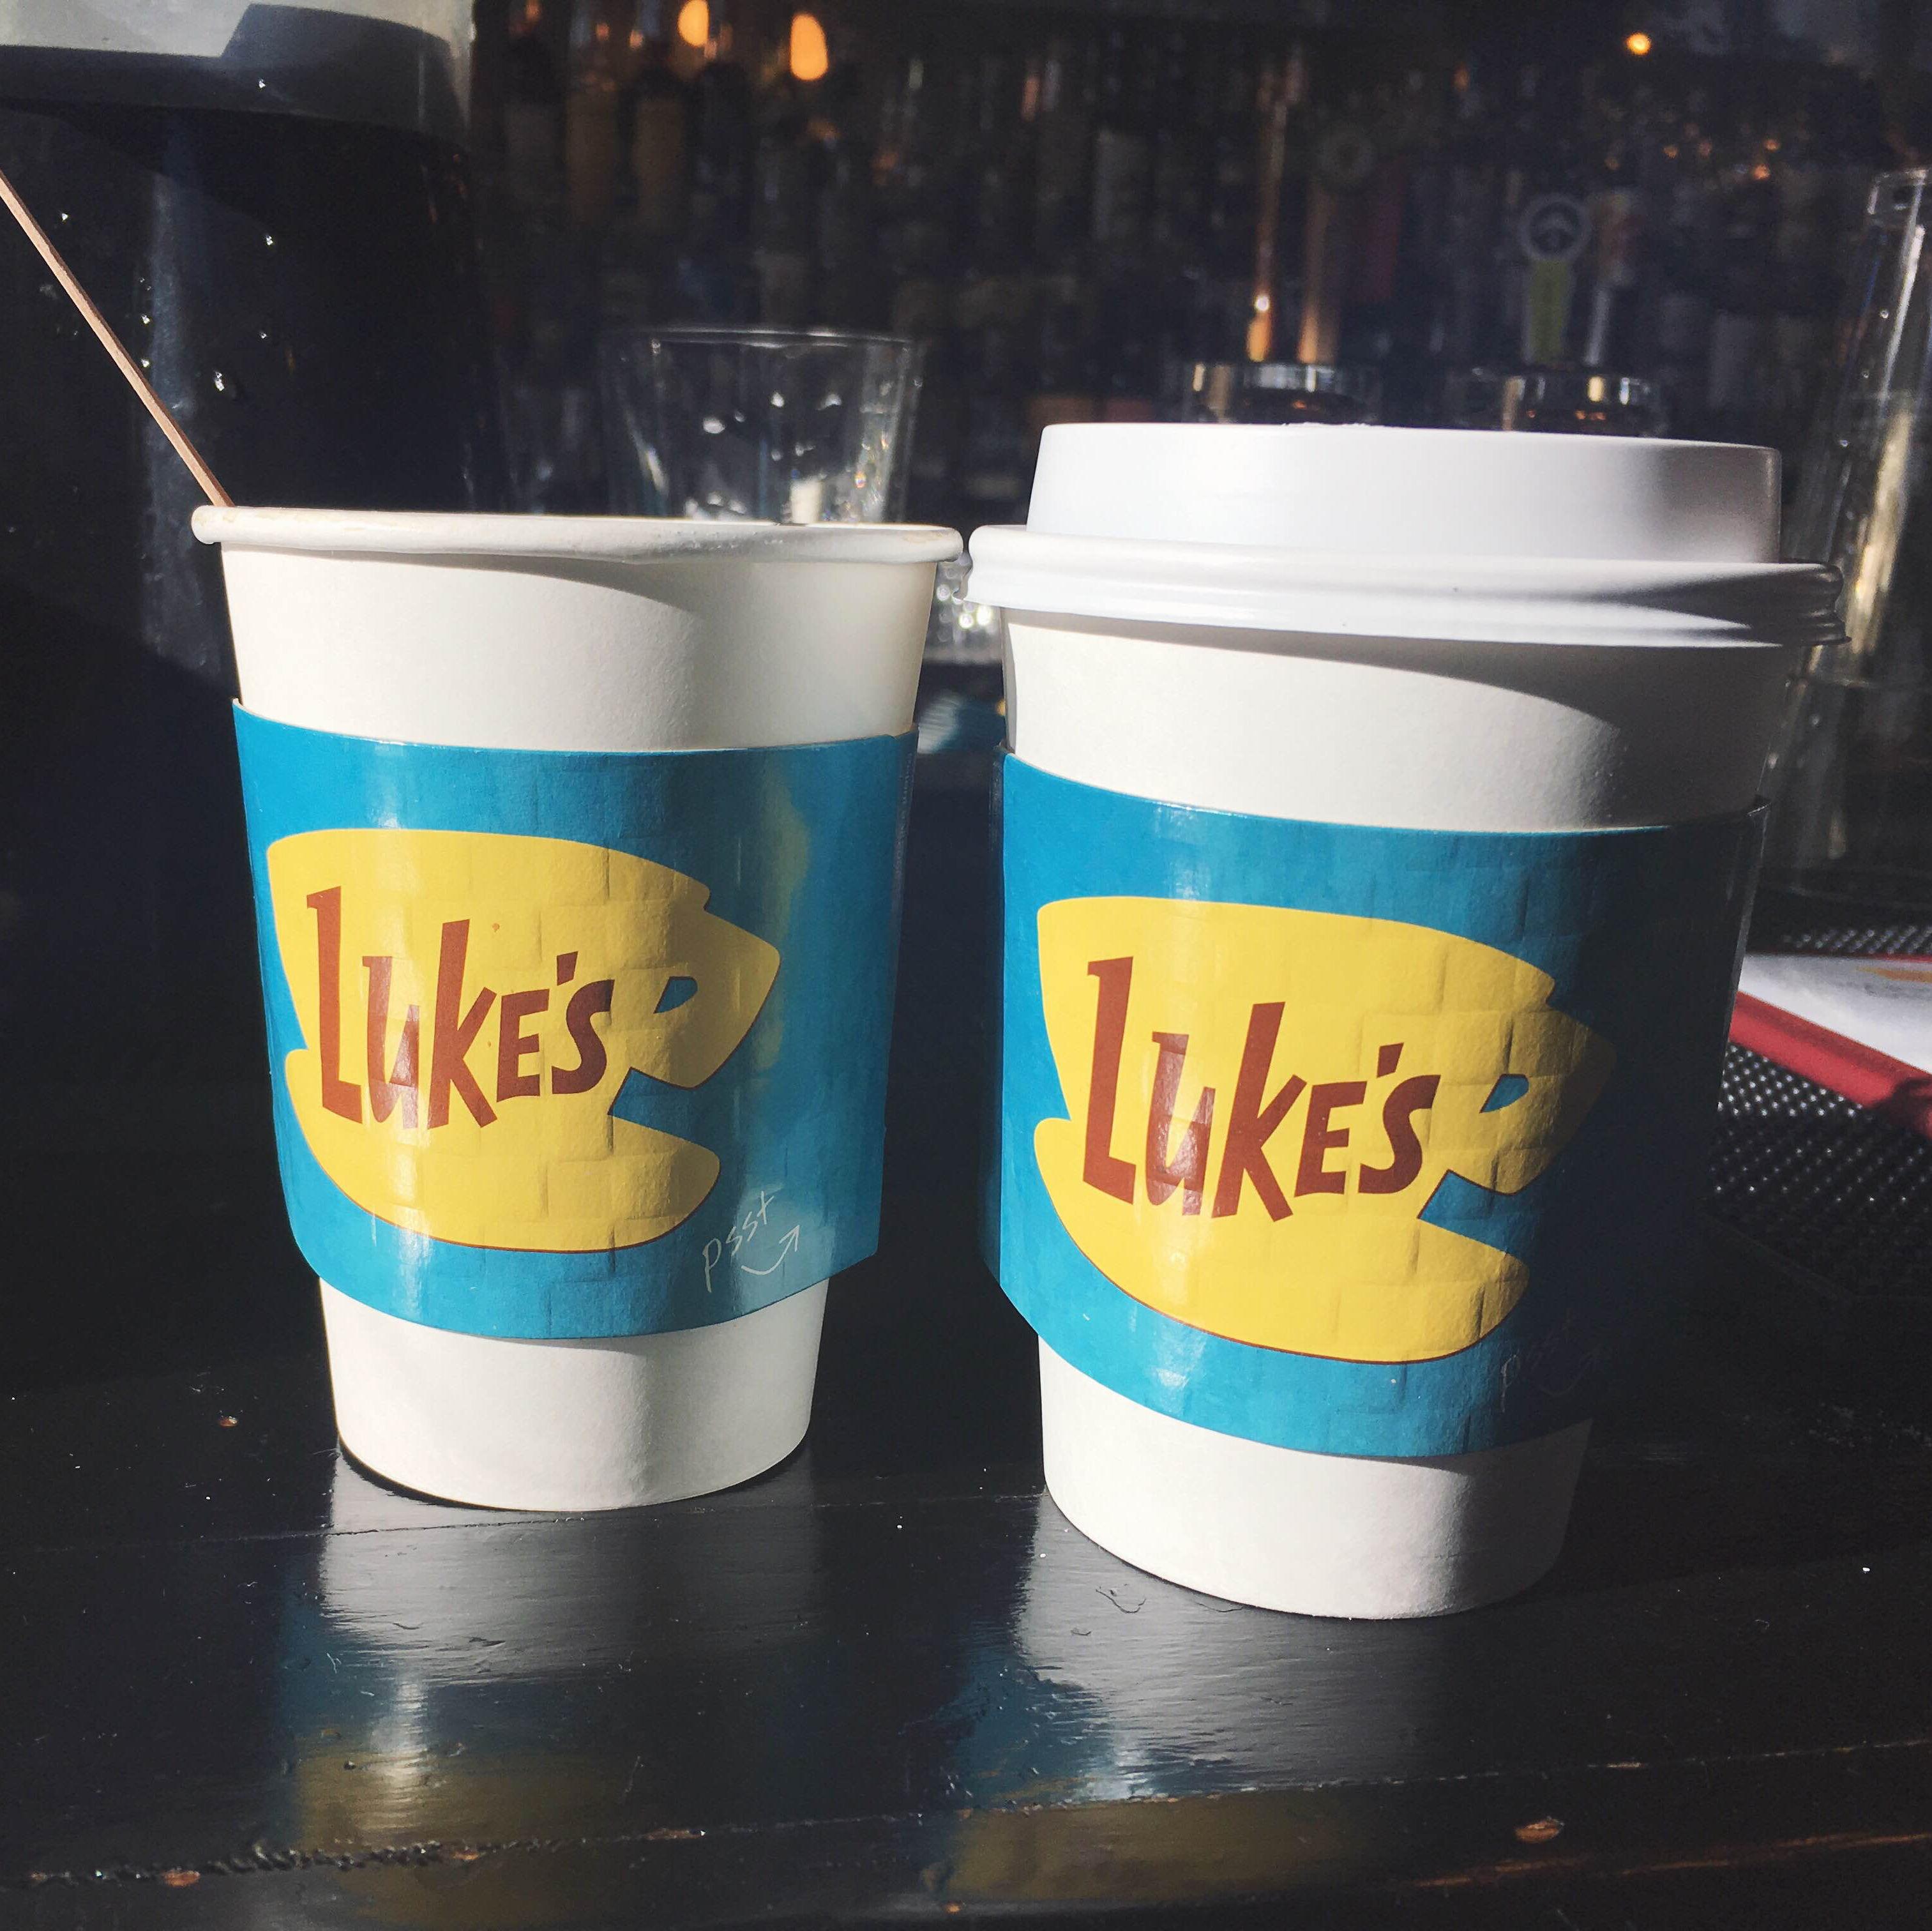 Lukes xyww0t